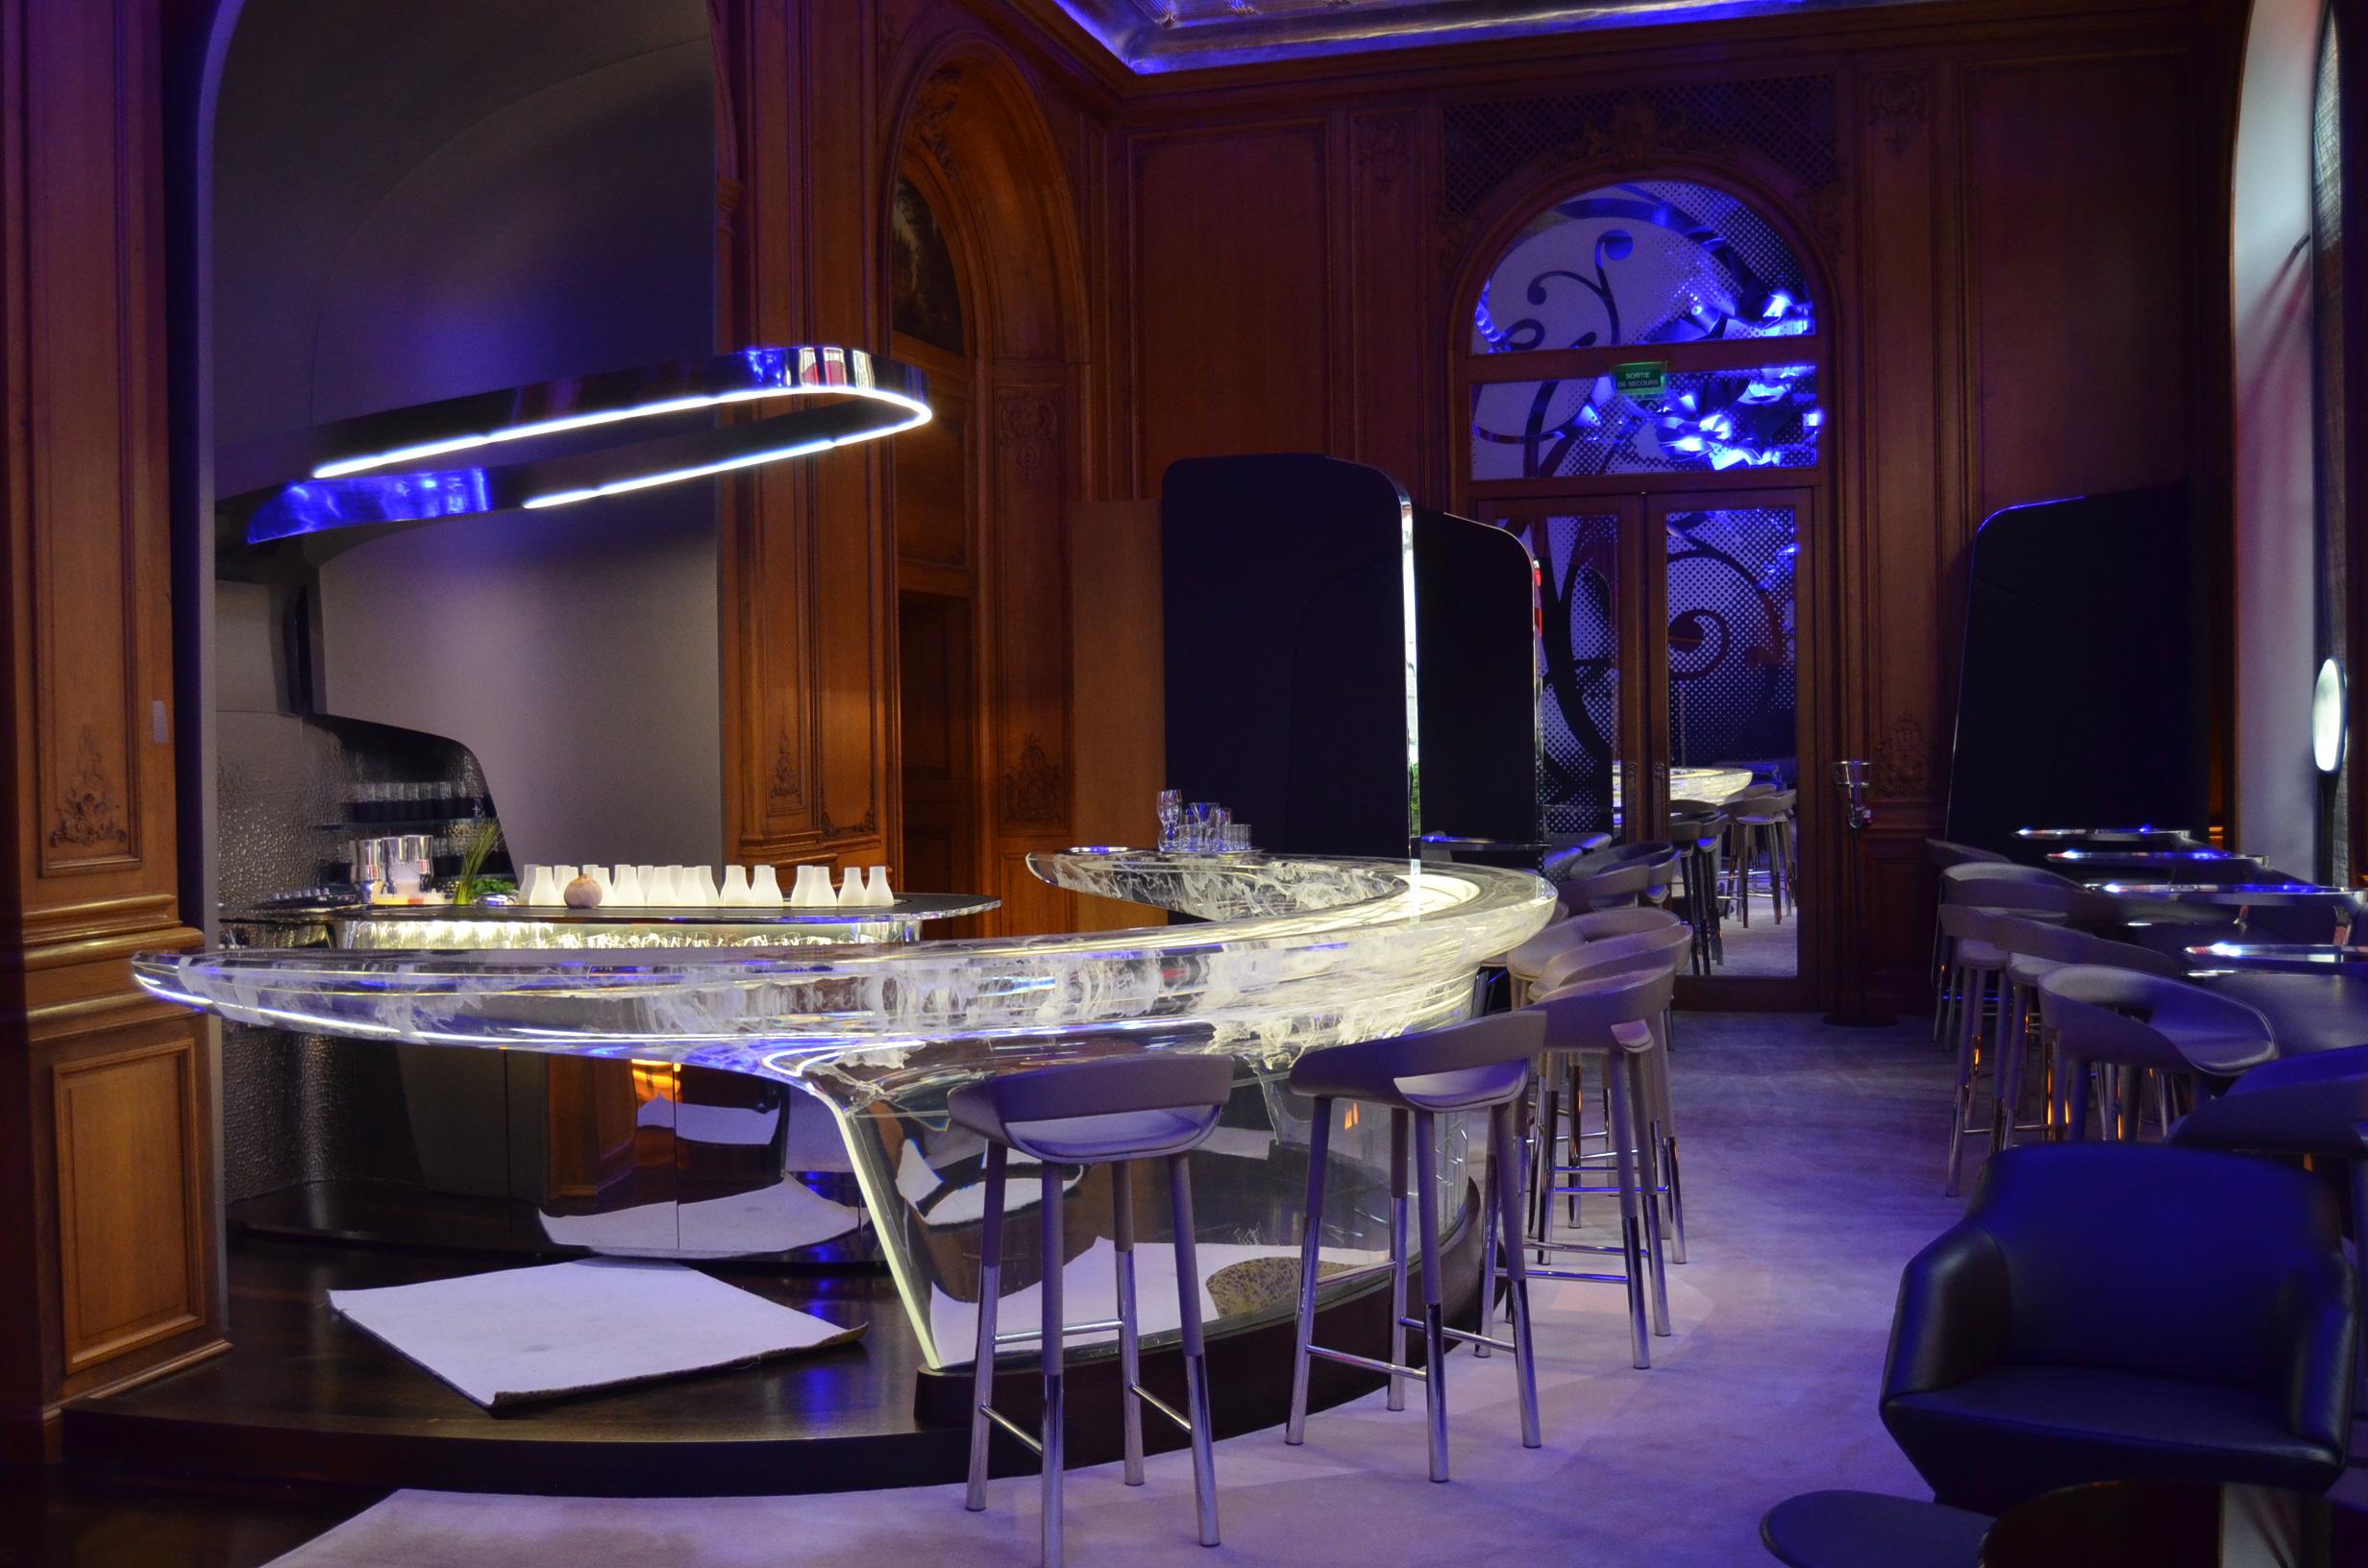 a hotel fit for a princess a peek inside paris 39 h tel plaza ath n e journeys around the globe. Black Bedroom Furniture Sets. Home Design Ideas